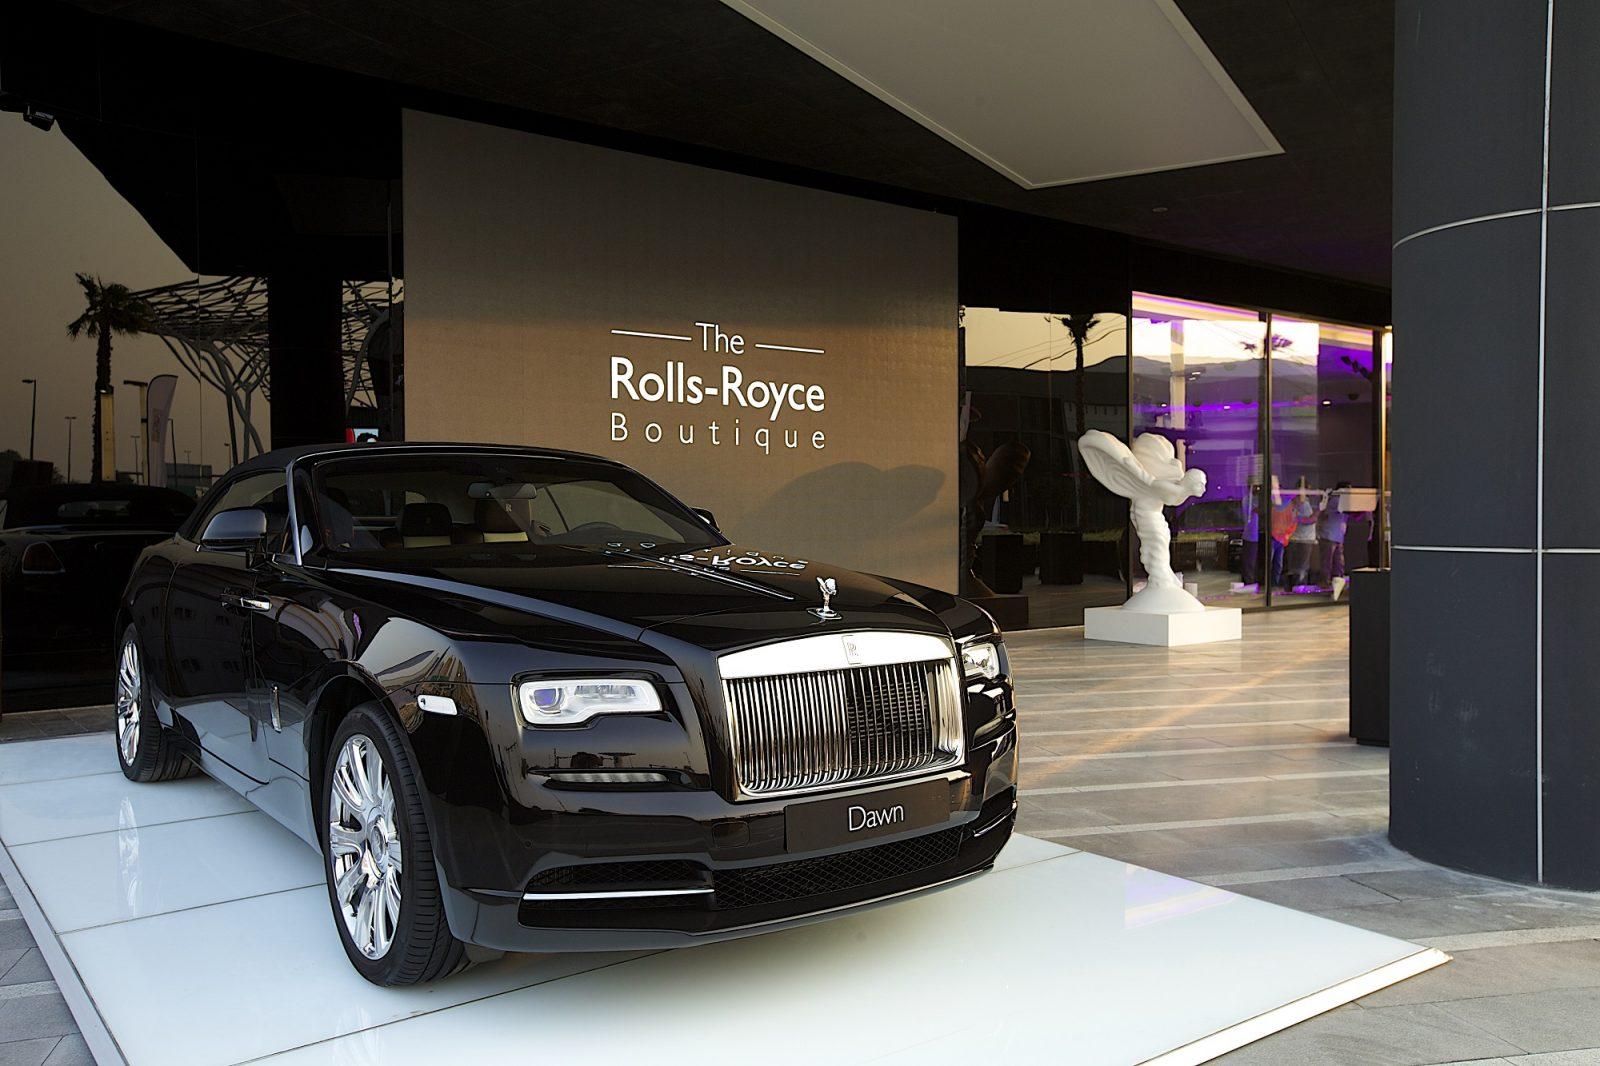 Rolls Royce Boutique Dubai